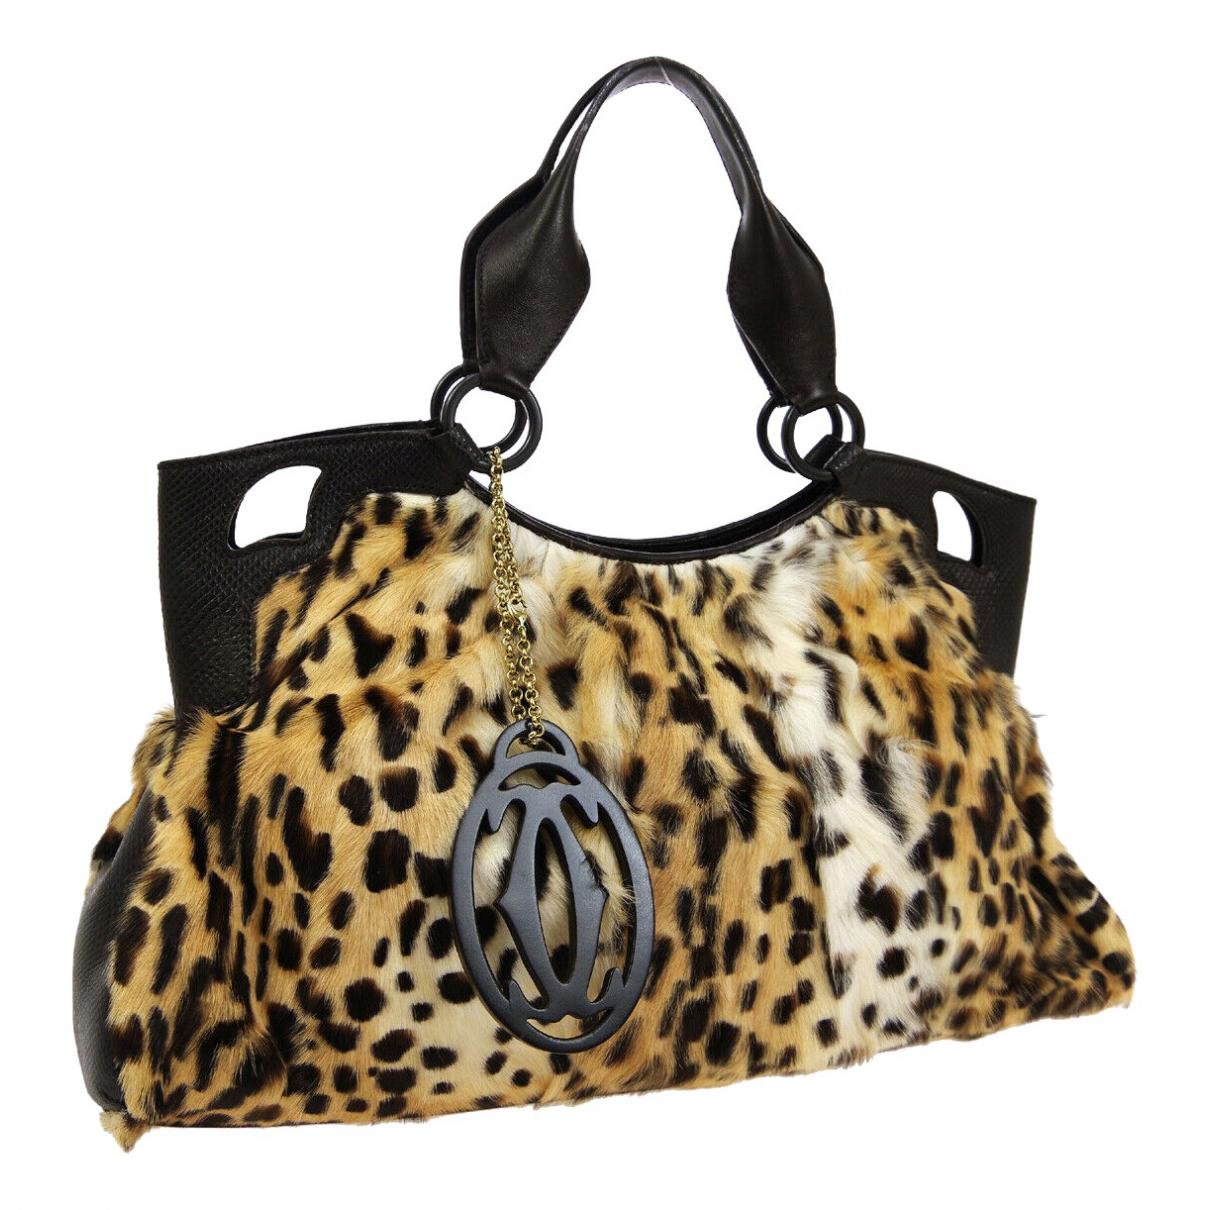 Cartier \N Brown Pony-style calfskin handbag for Women \N